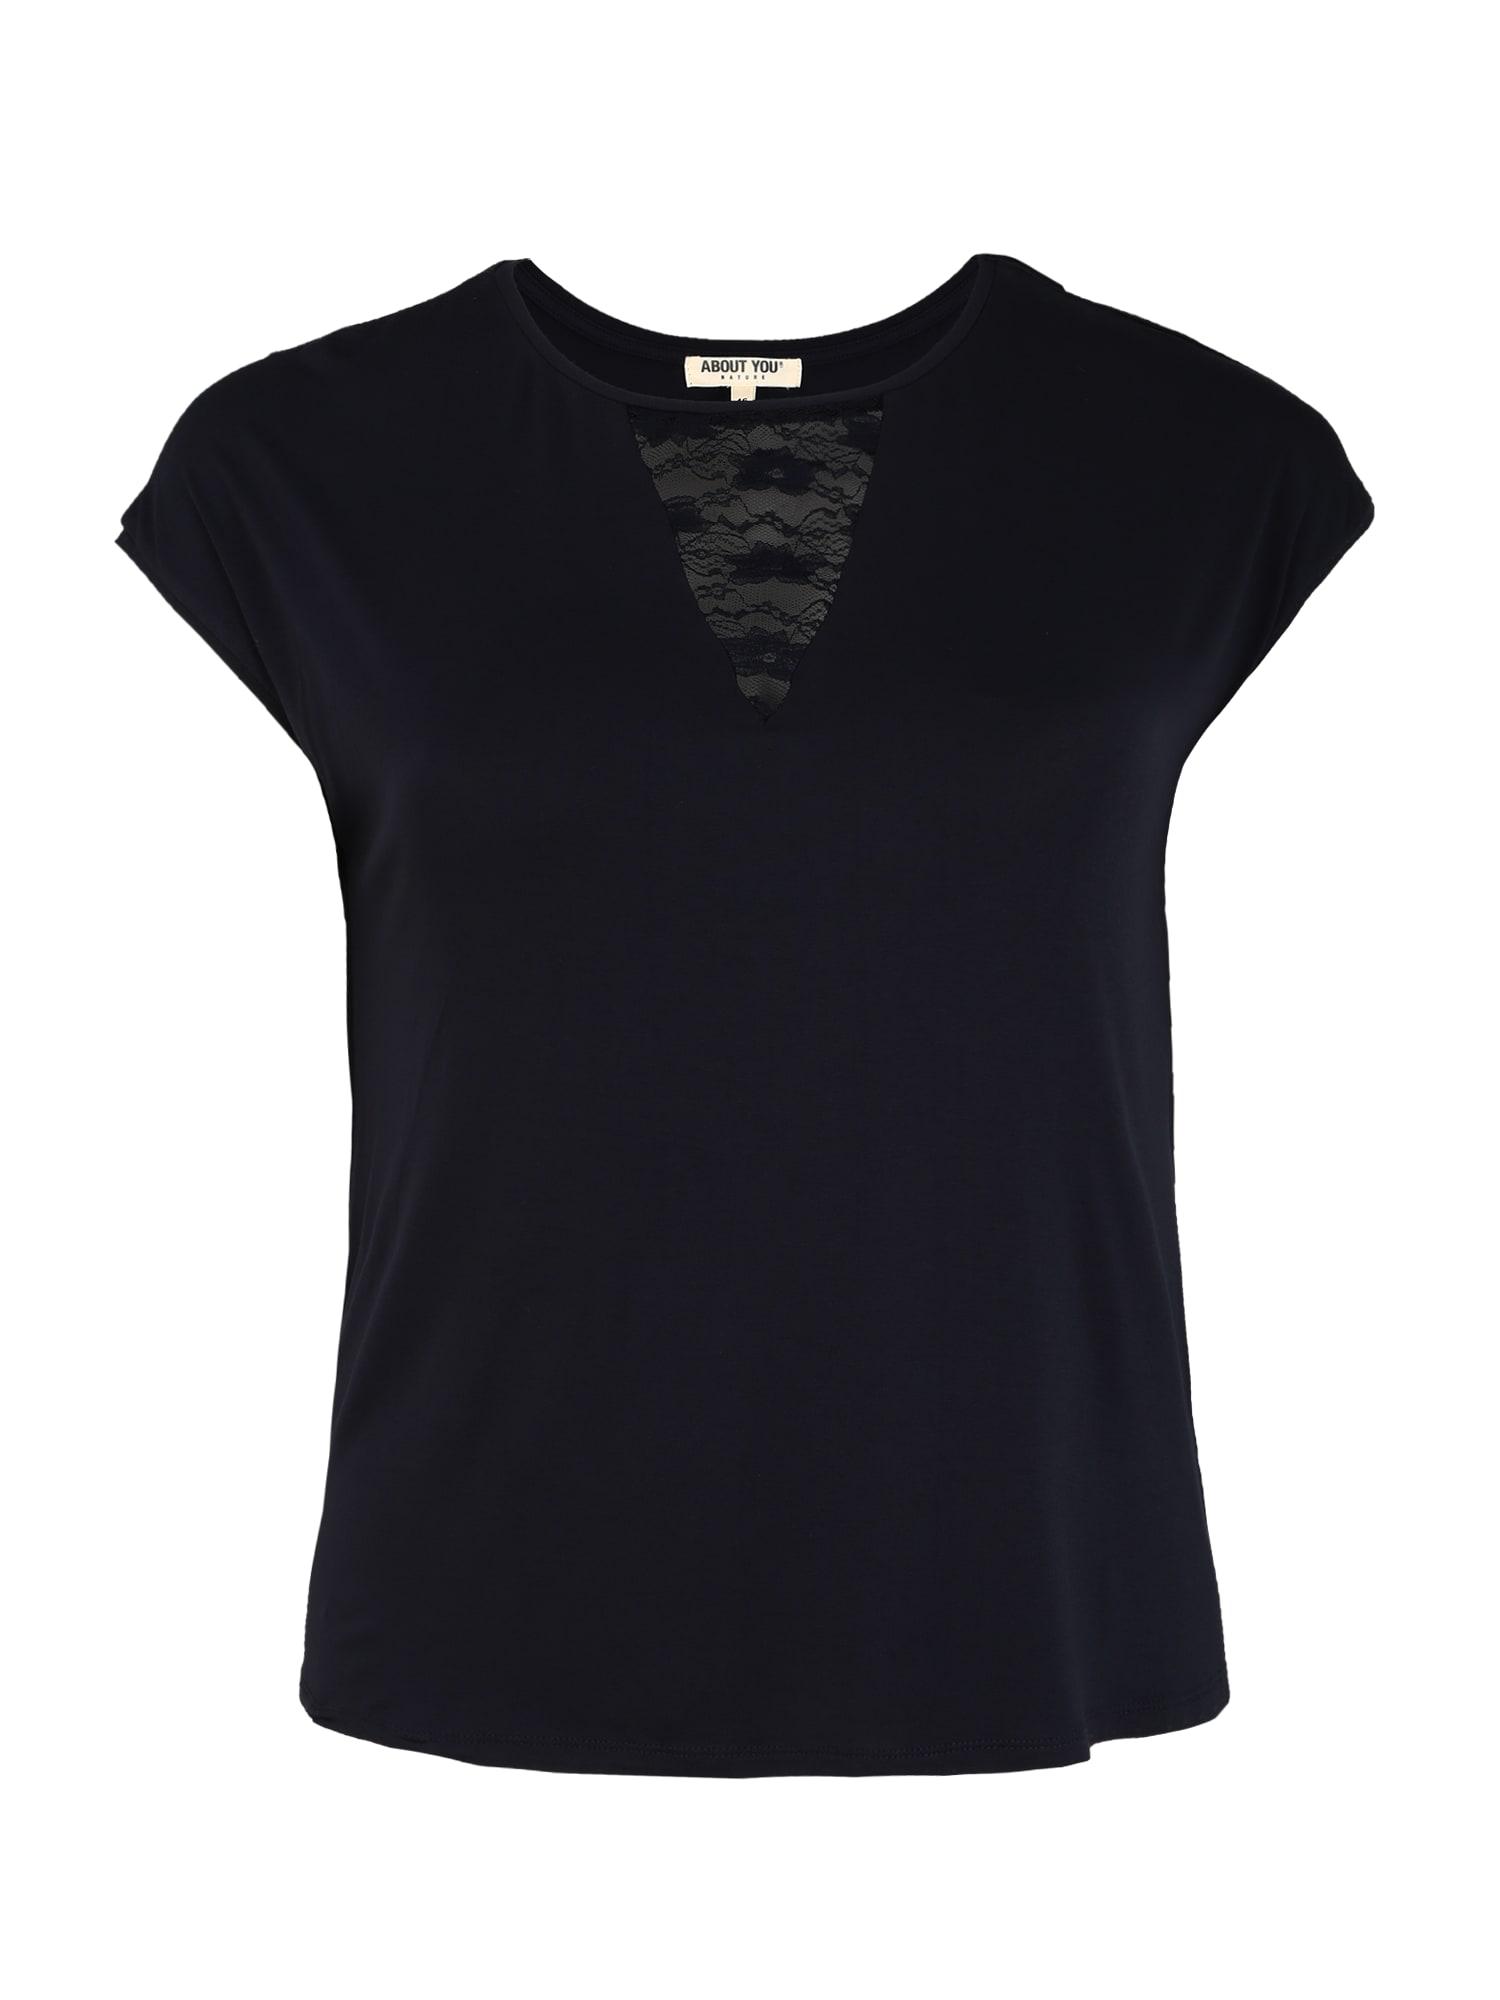 ABOUT YOU Curvy Marškinėliai 'Lisa' tamsiai mėlyna